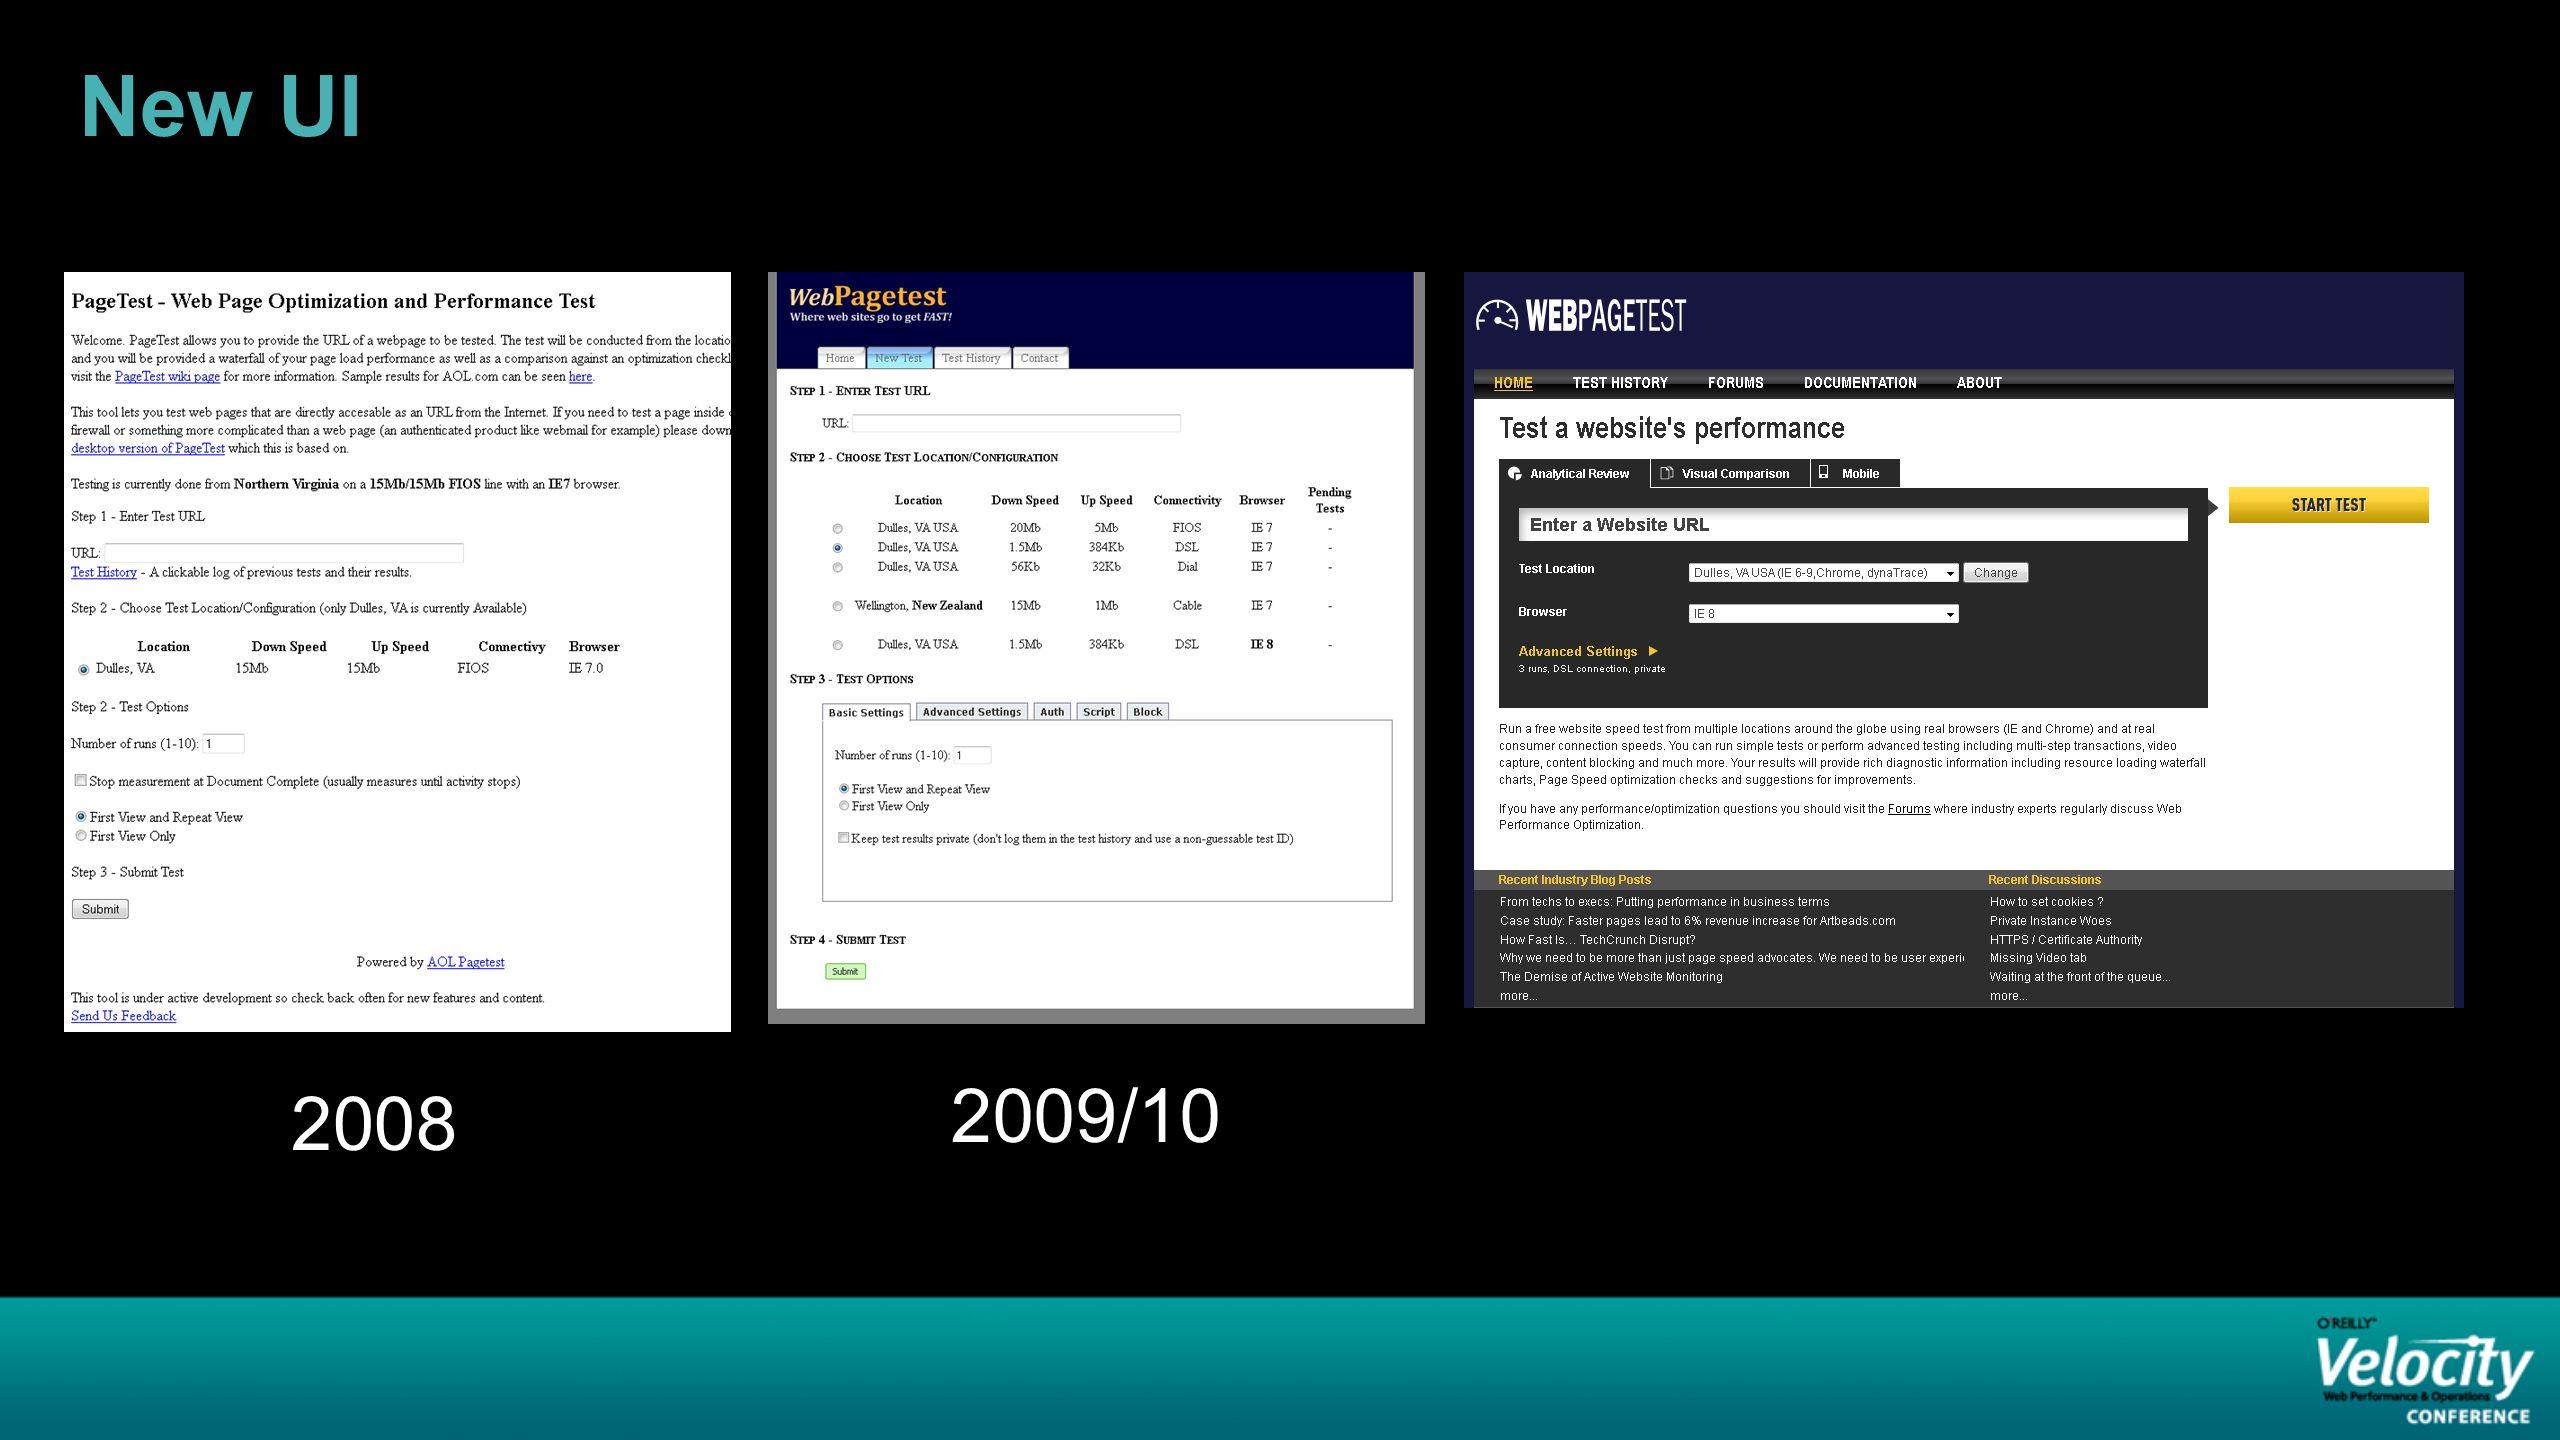 New UI 2008 2009/10